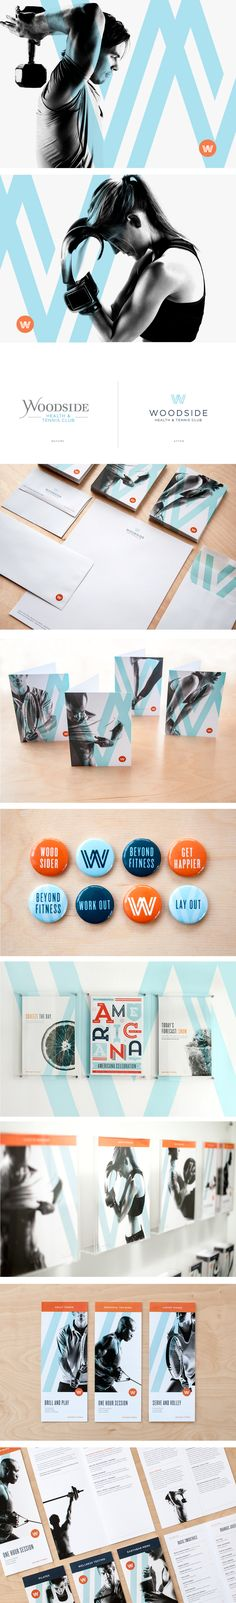 Woodside Health & Tennis Club | Art Direction, Branding, Copywriting, Design, Interior Integration, Signage, Wayfinding, Website | Design Ranch